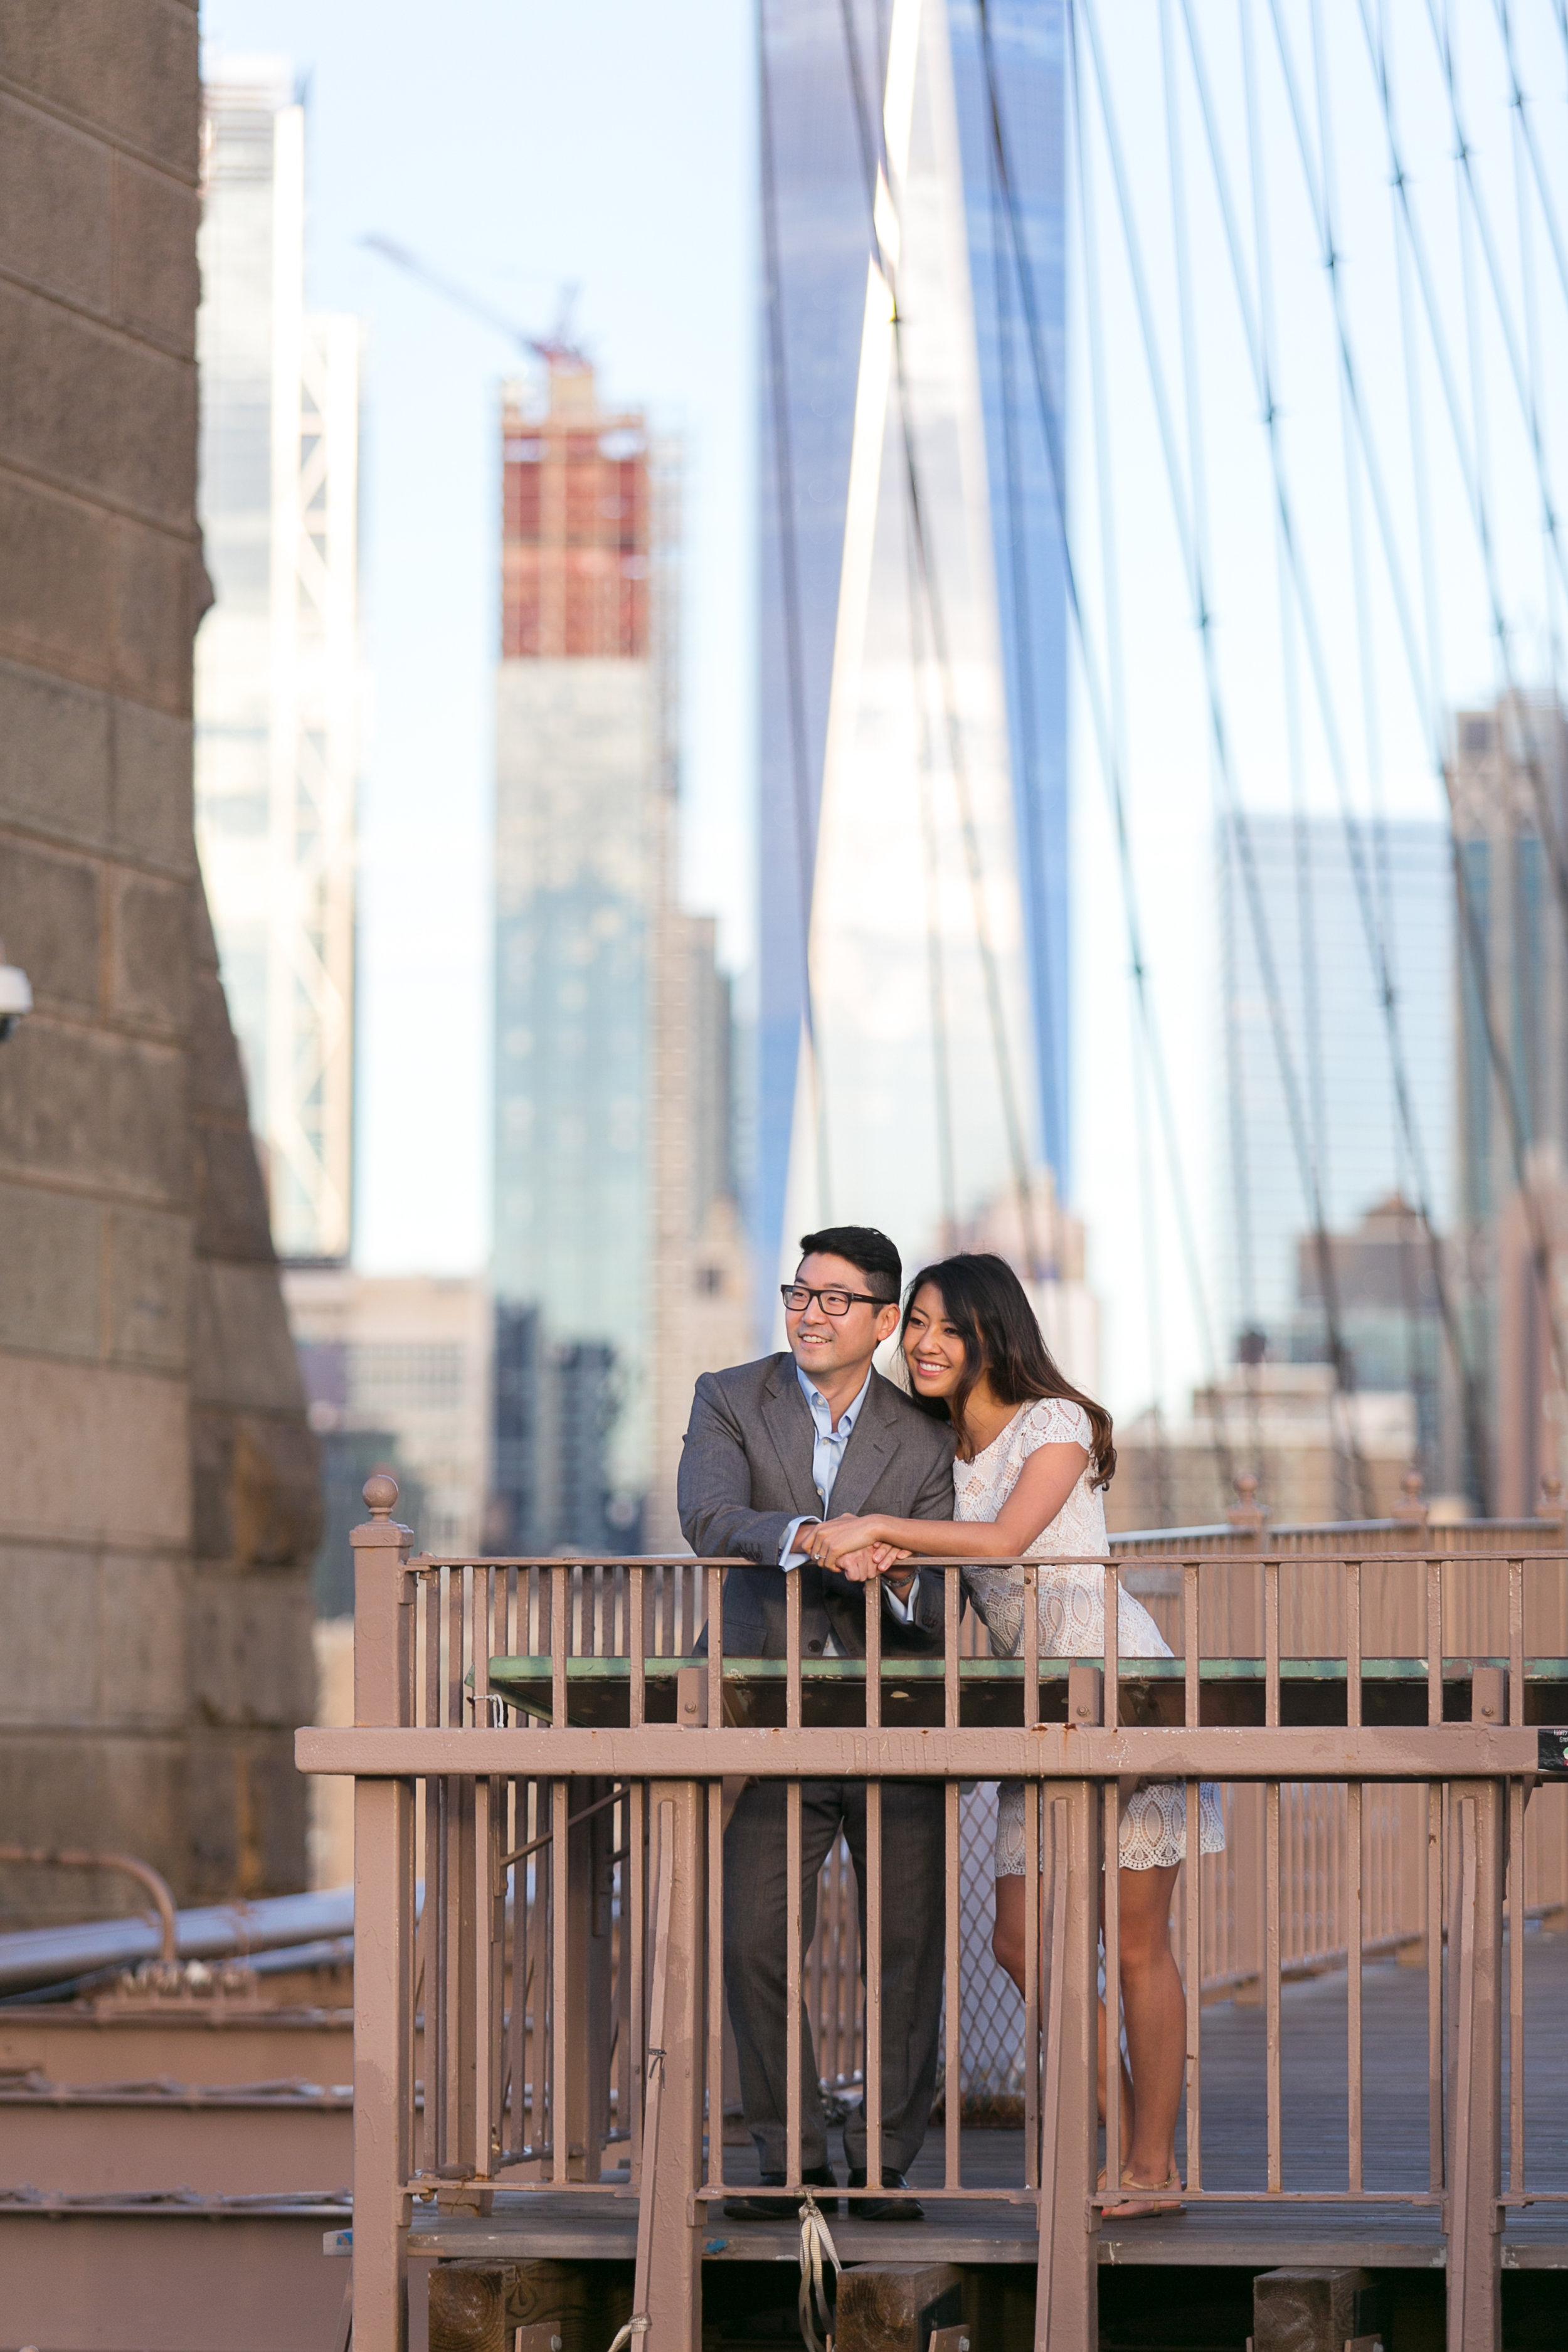 New_York_Engagement_Session_003.jpg